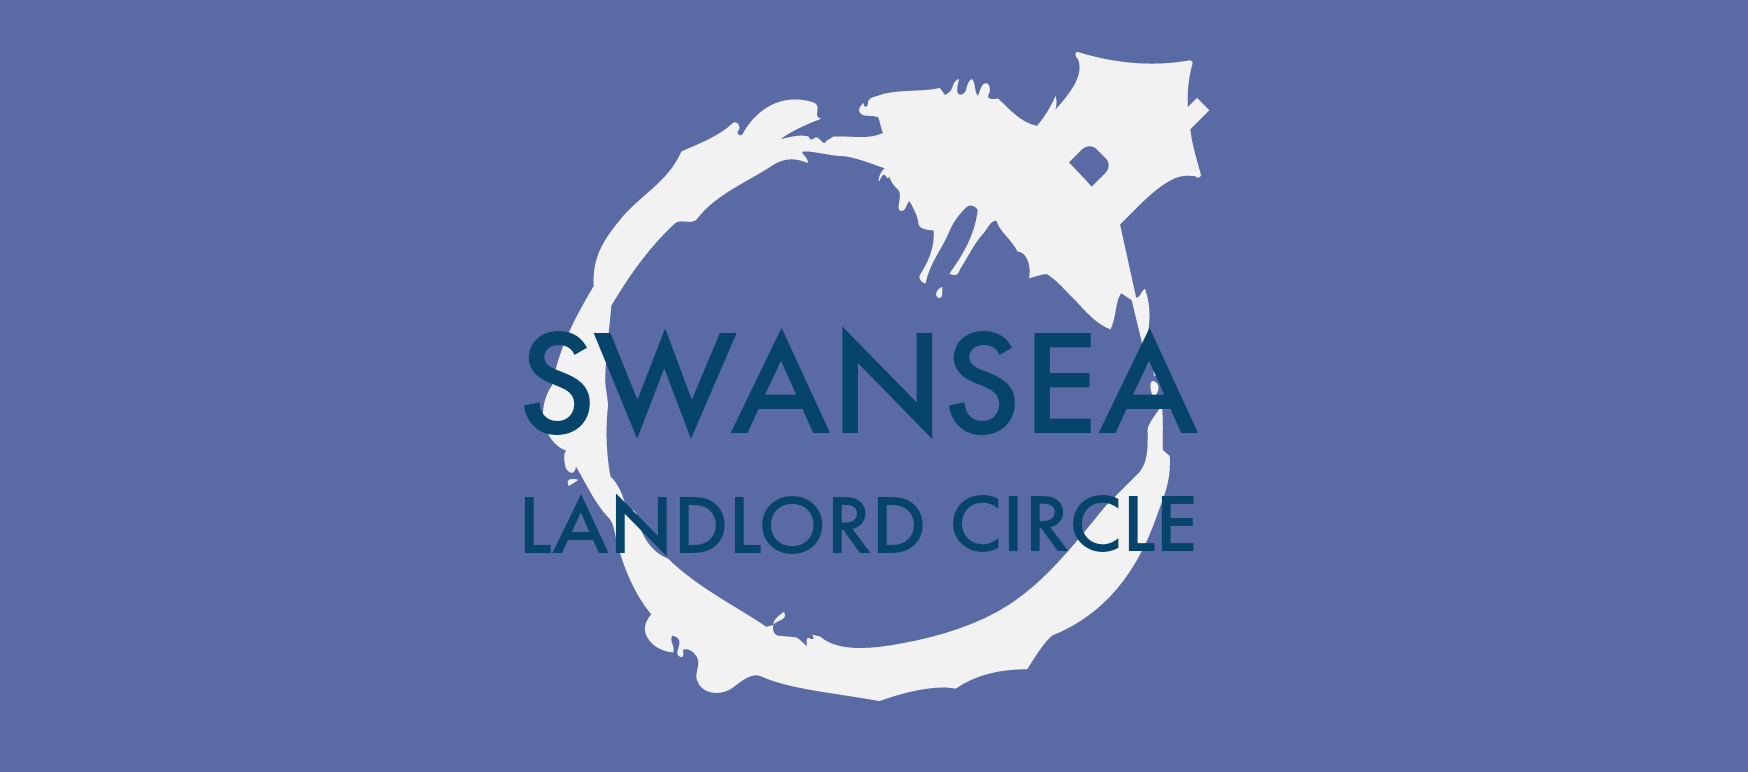 New Group for Swansea Landlords